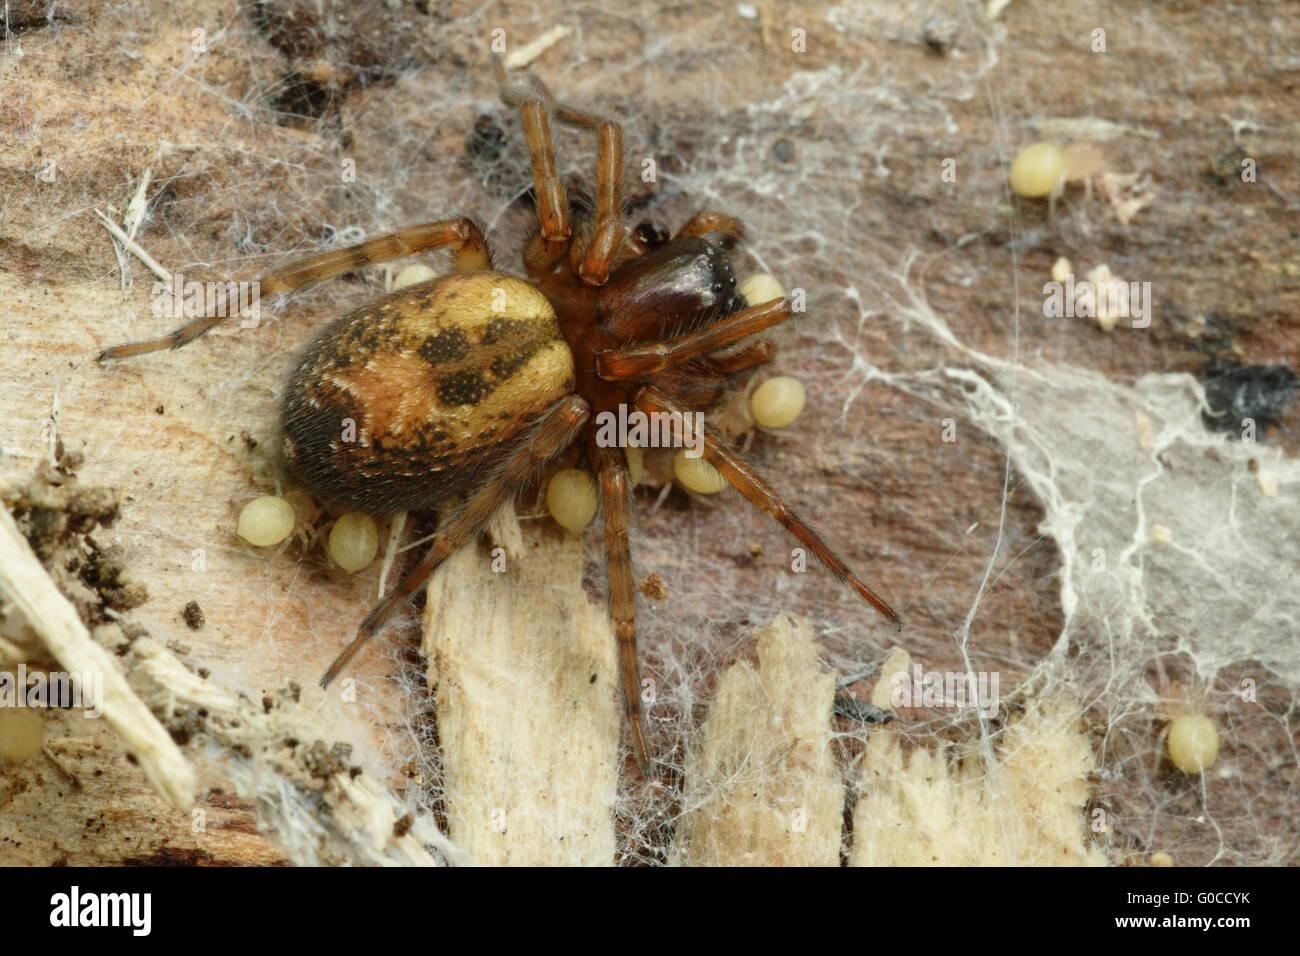 Dangeros nursery - Lace webbed spider - Stock Image